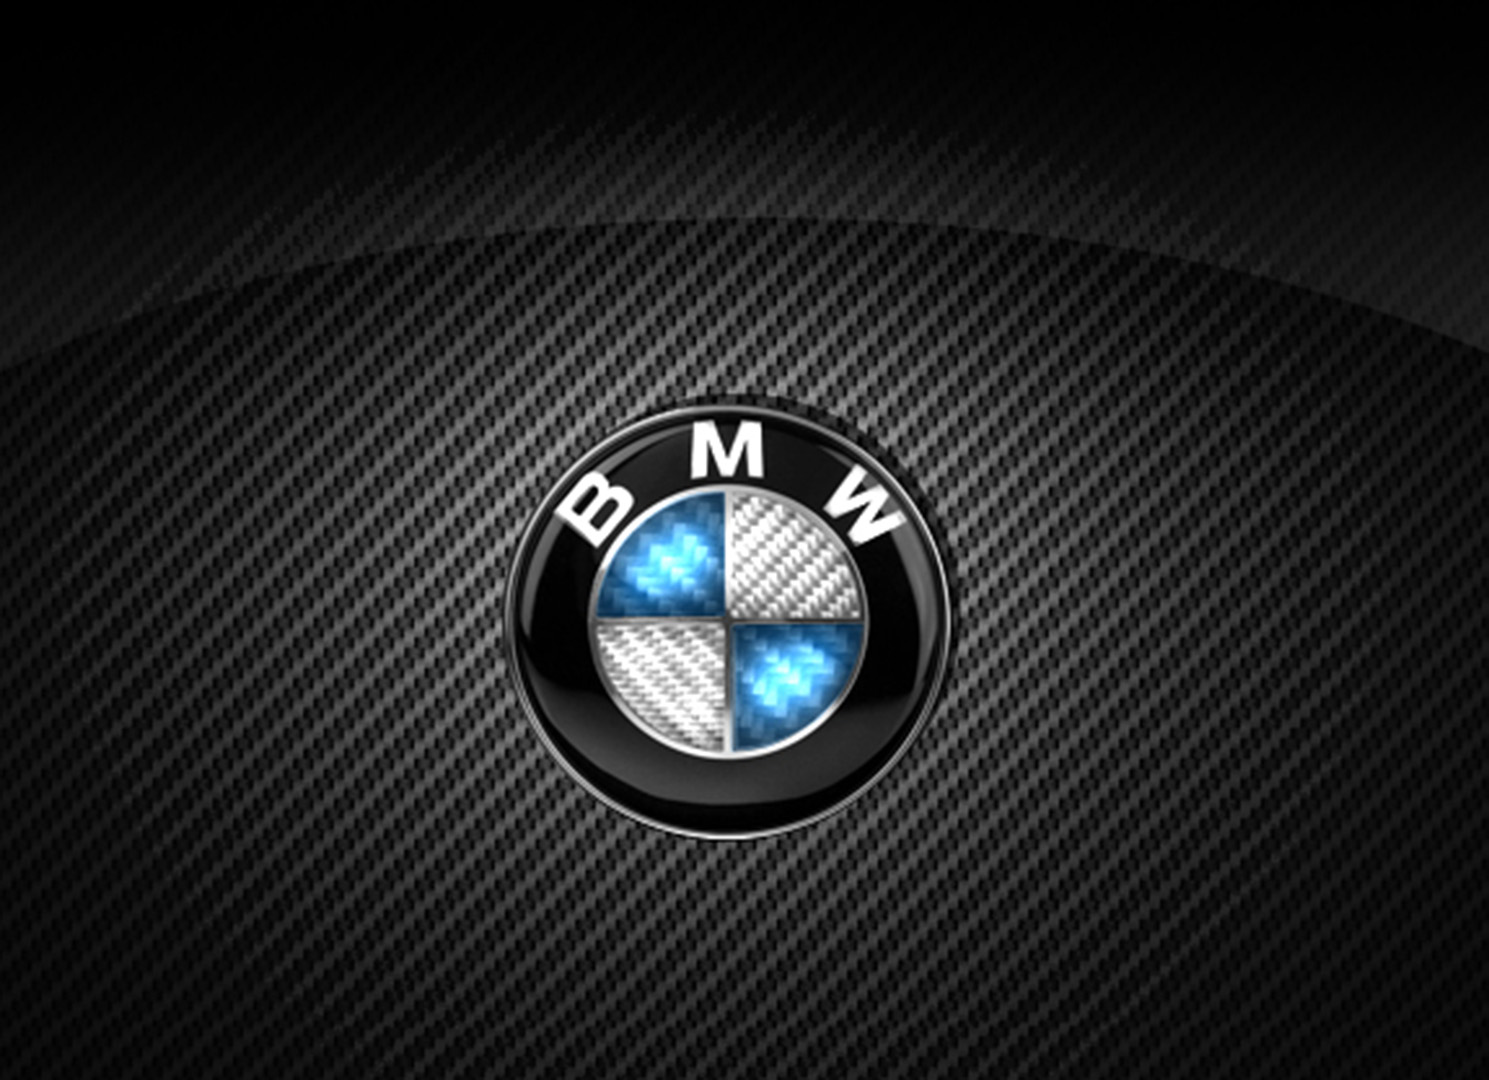 BMW Logo HD Wallpaper - WallpaperSafari